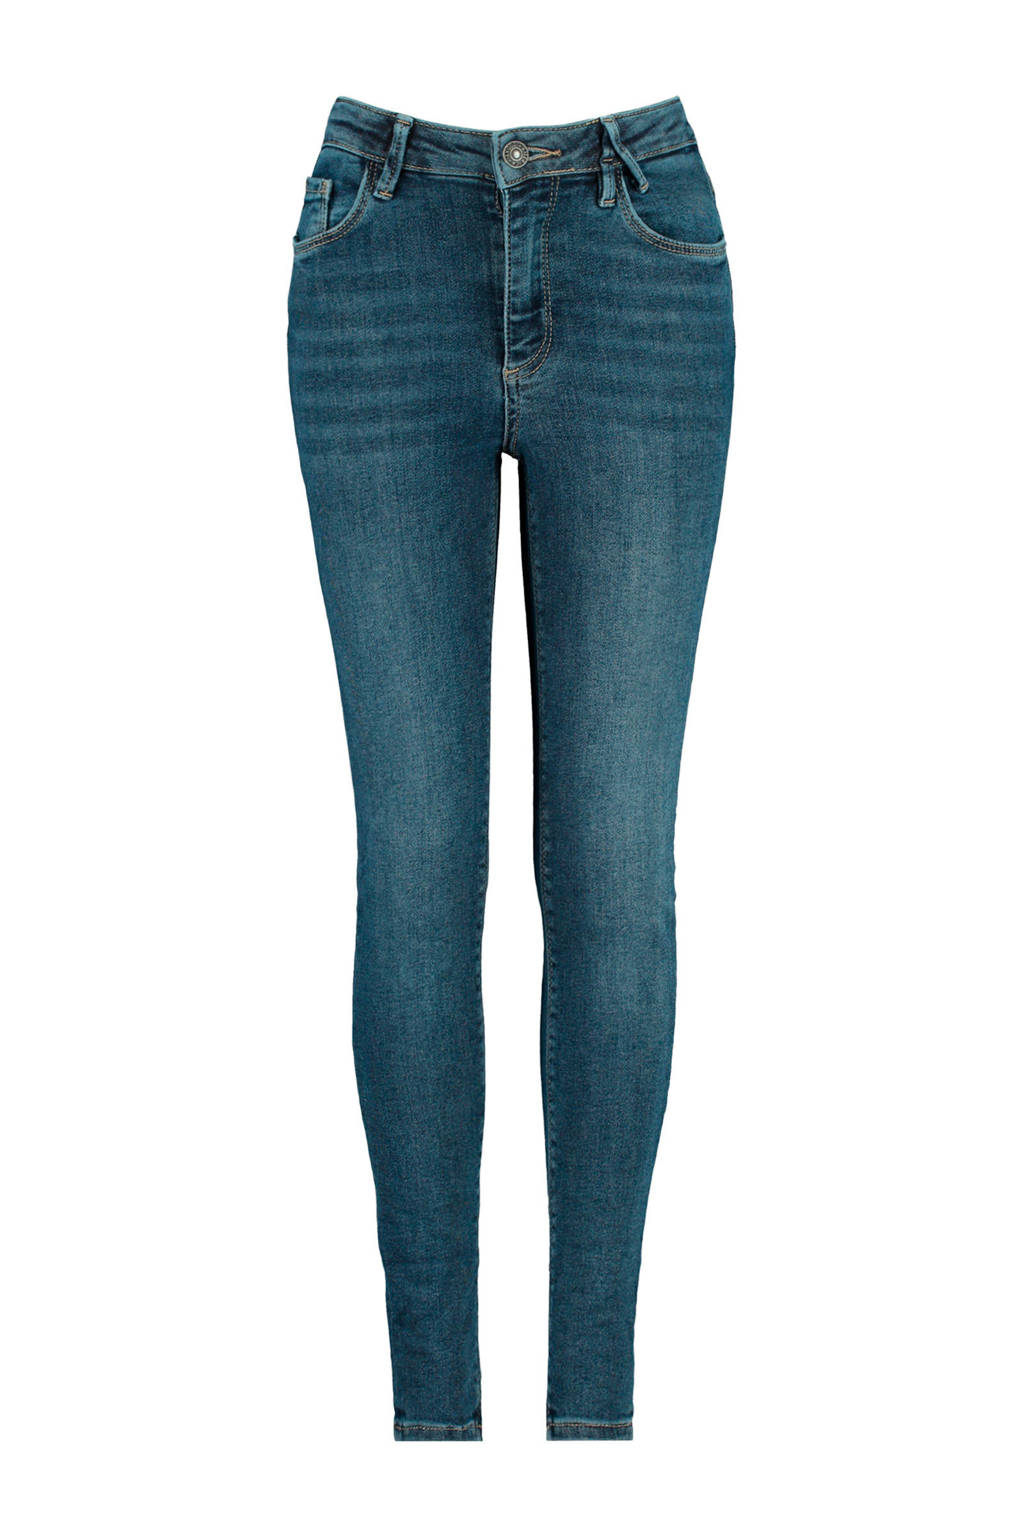 America Today Junior high waist skinny jeans stonewashed, Stonewashed